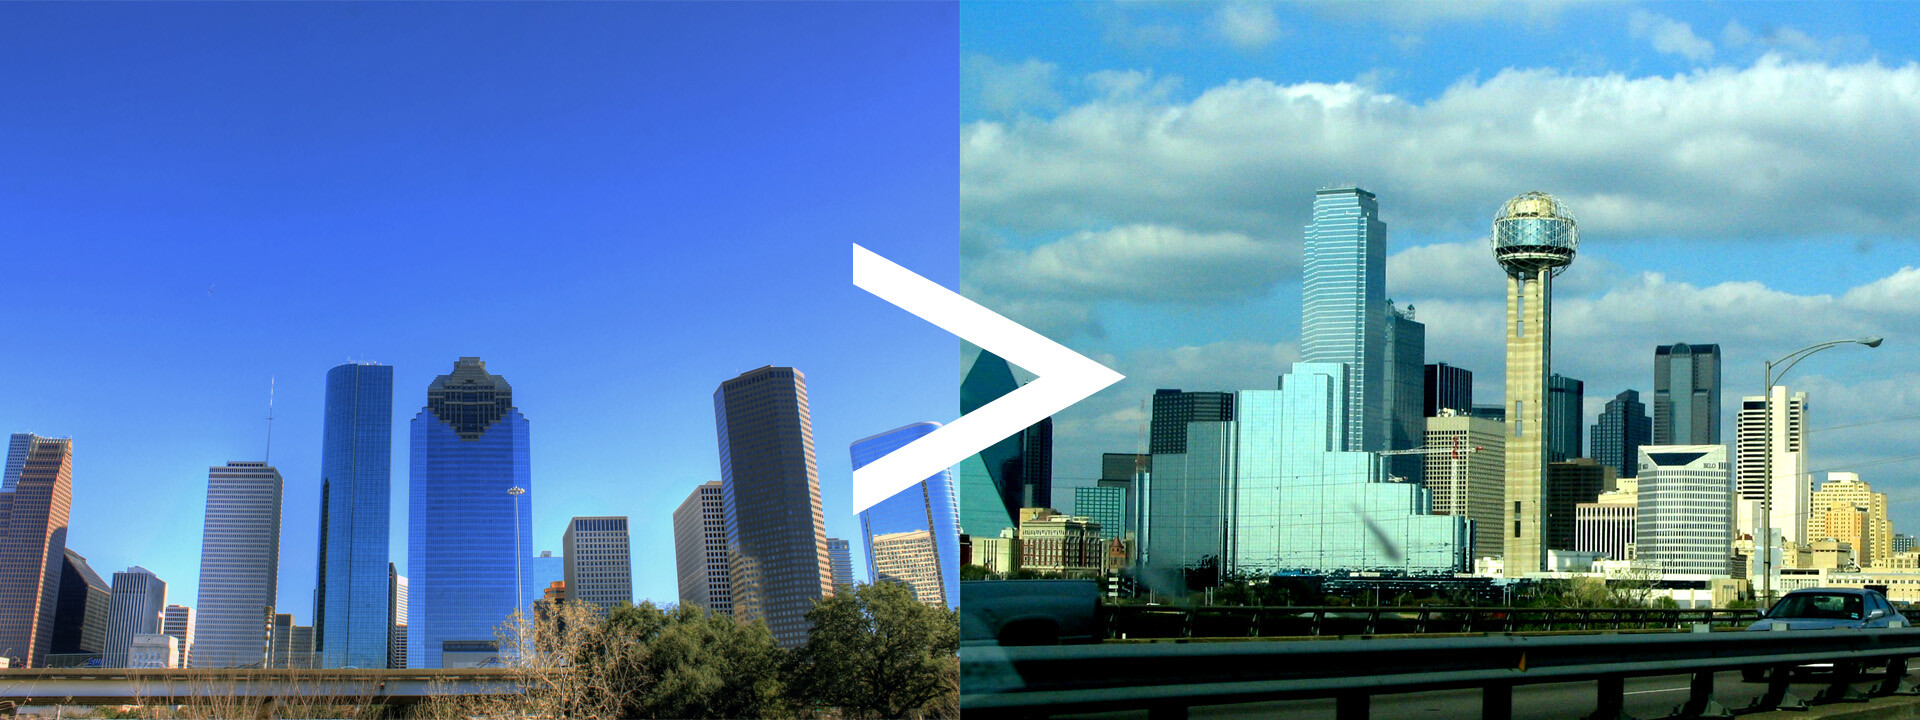 Auto Transport Route Houston to Dallas